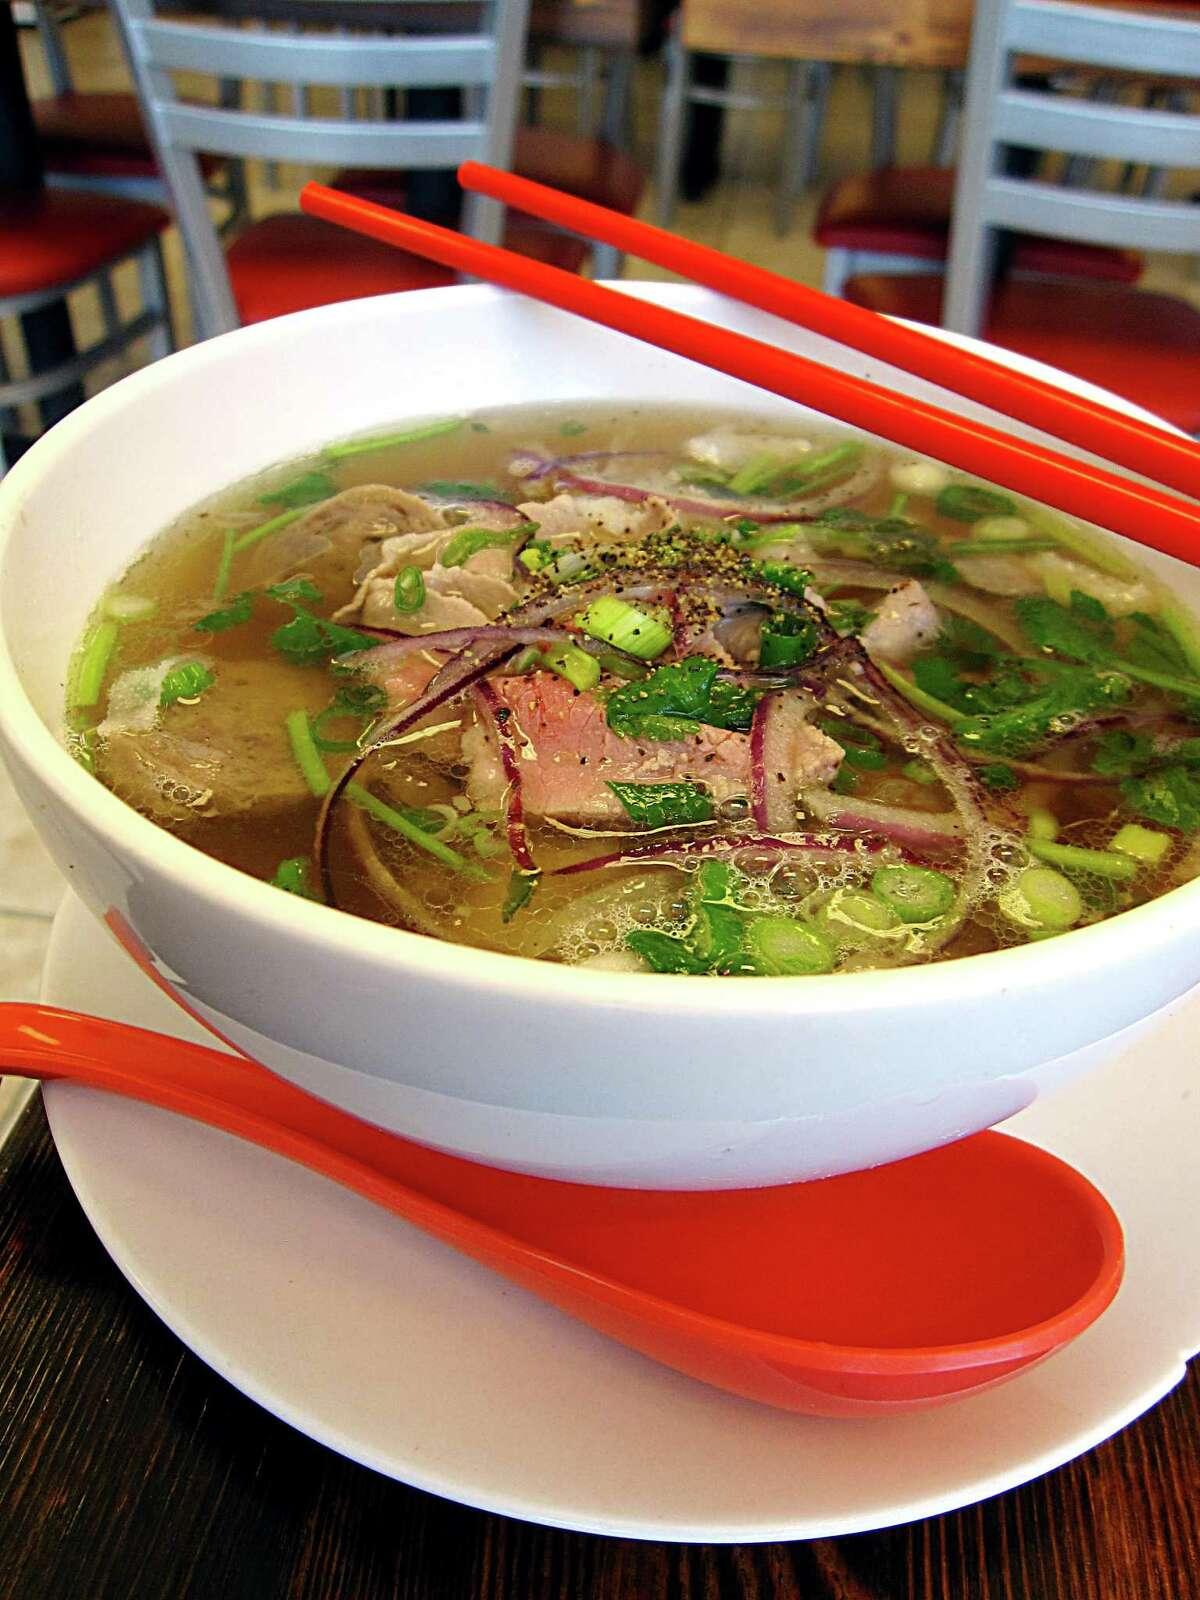 No. 1 Pho with brisket, tendon, tripe and sliced meatballs from Berni Vietnamese Restaurant